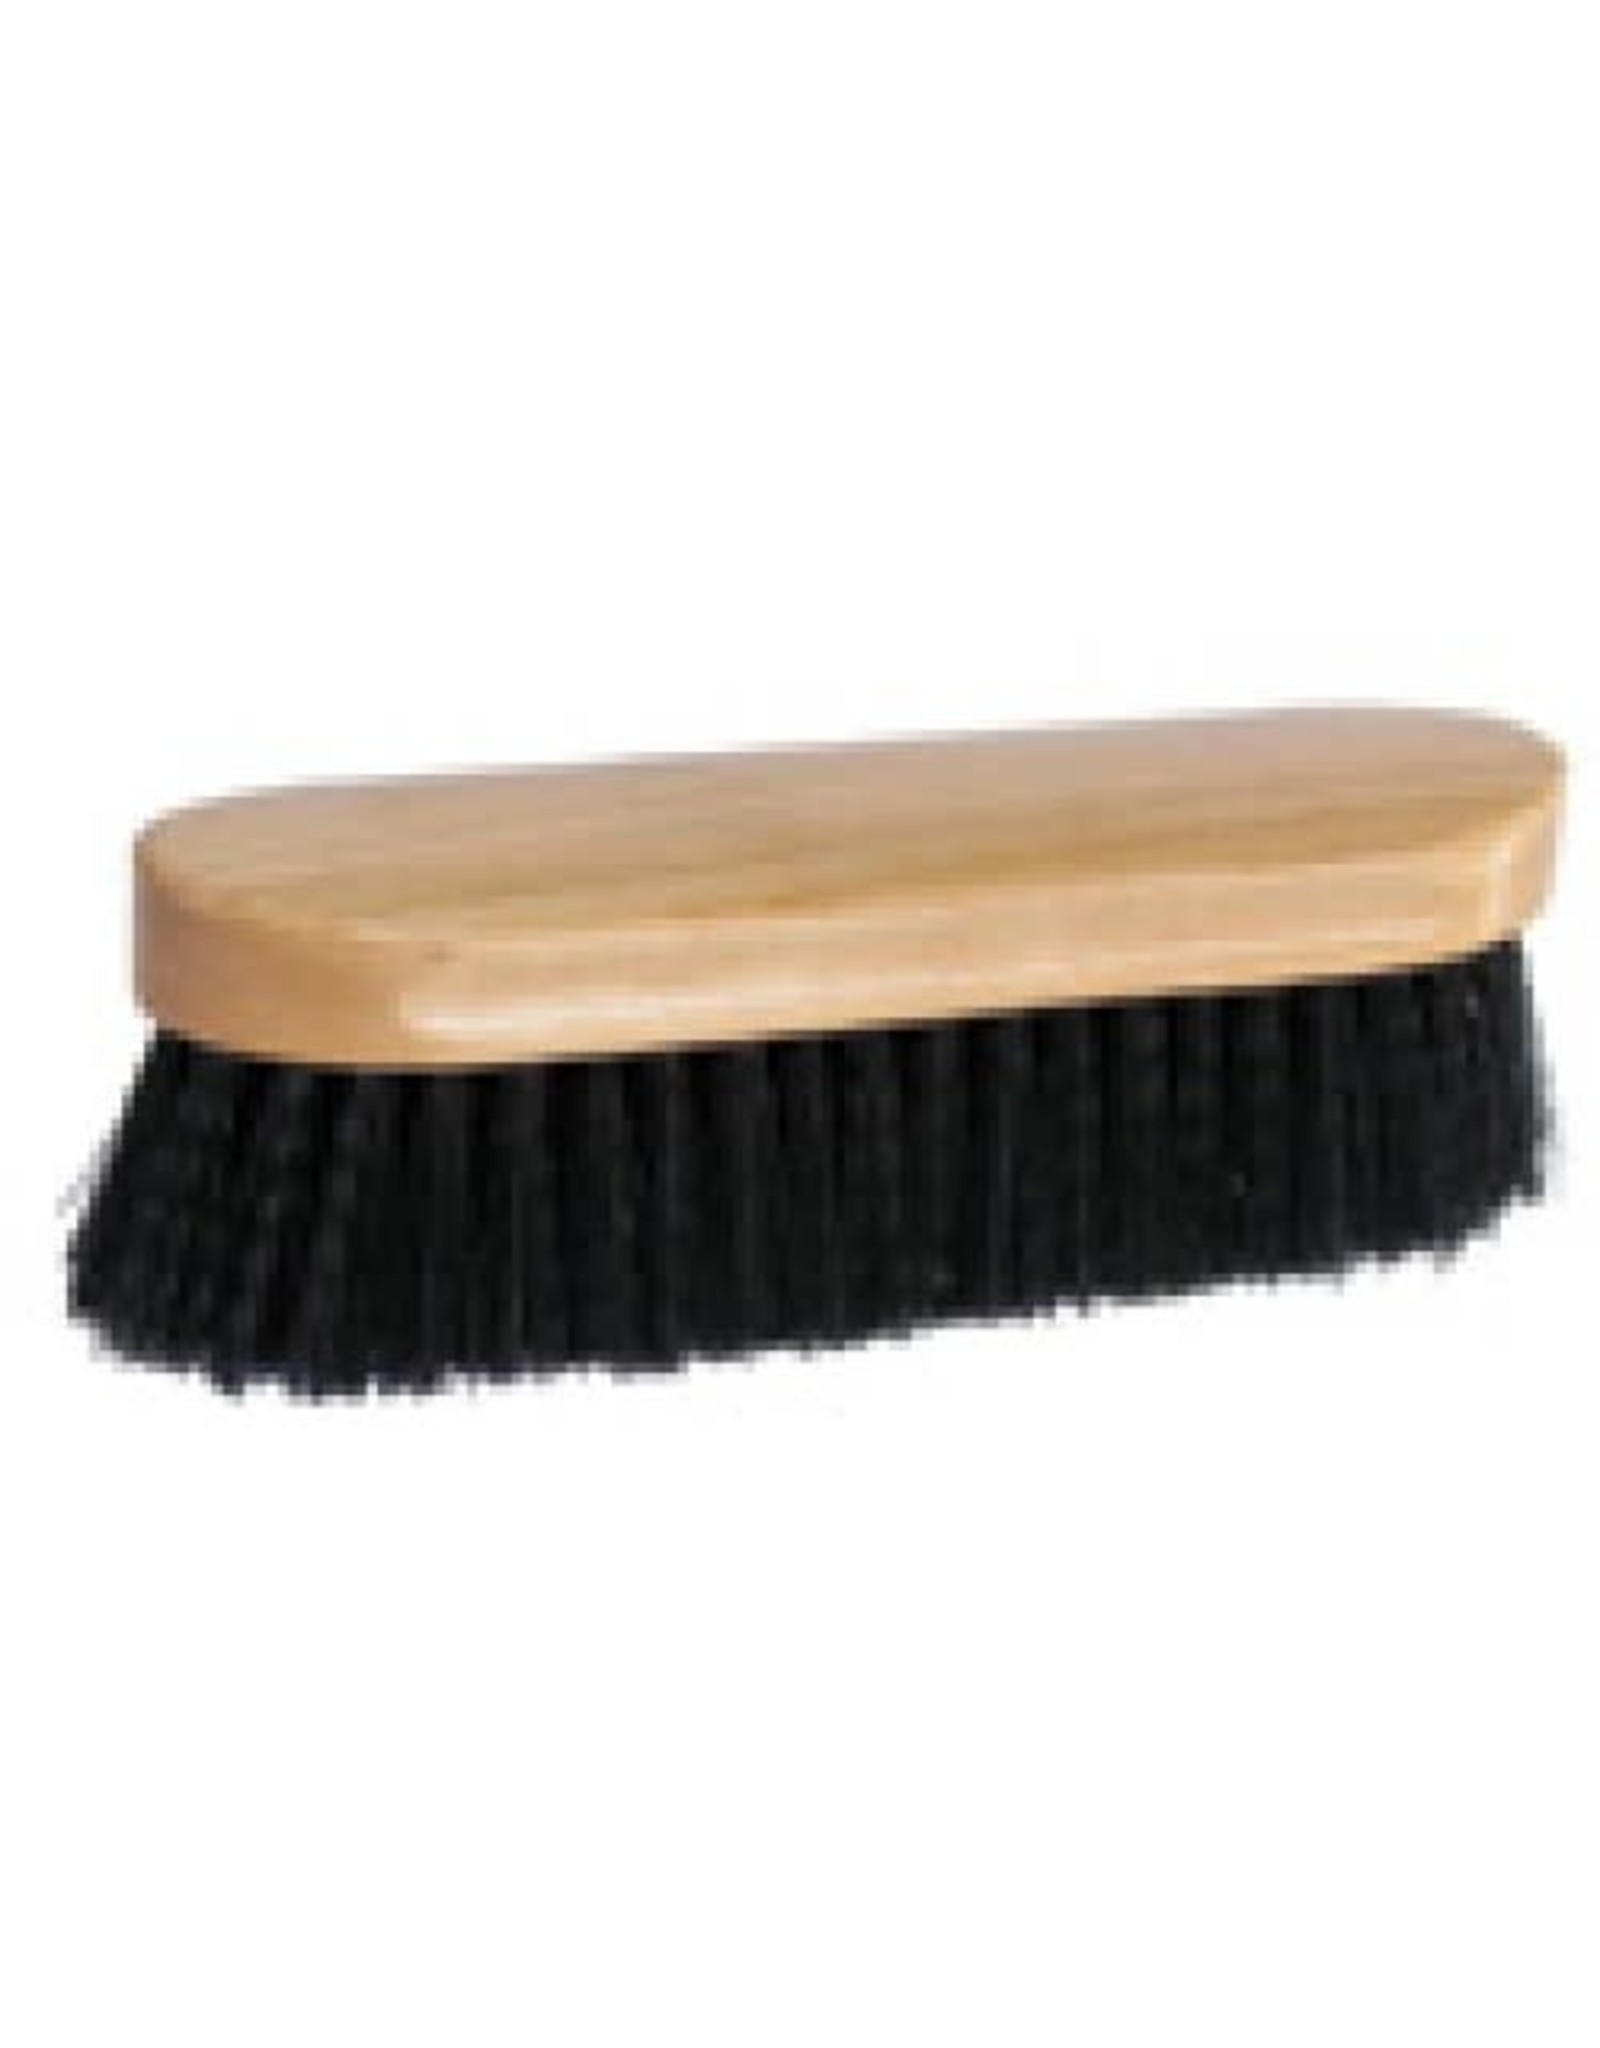 Brush/Stiff Dandy Black - 374316-27